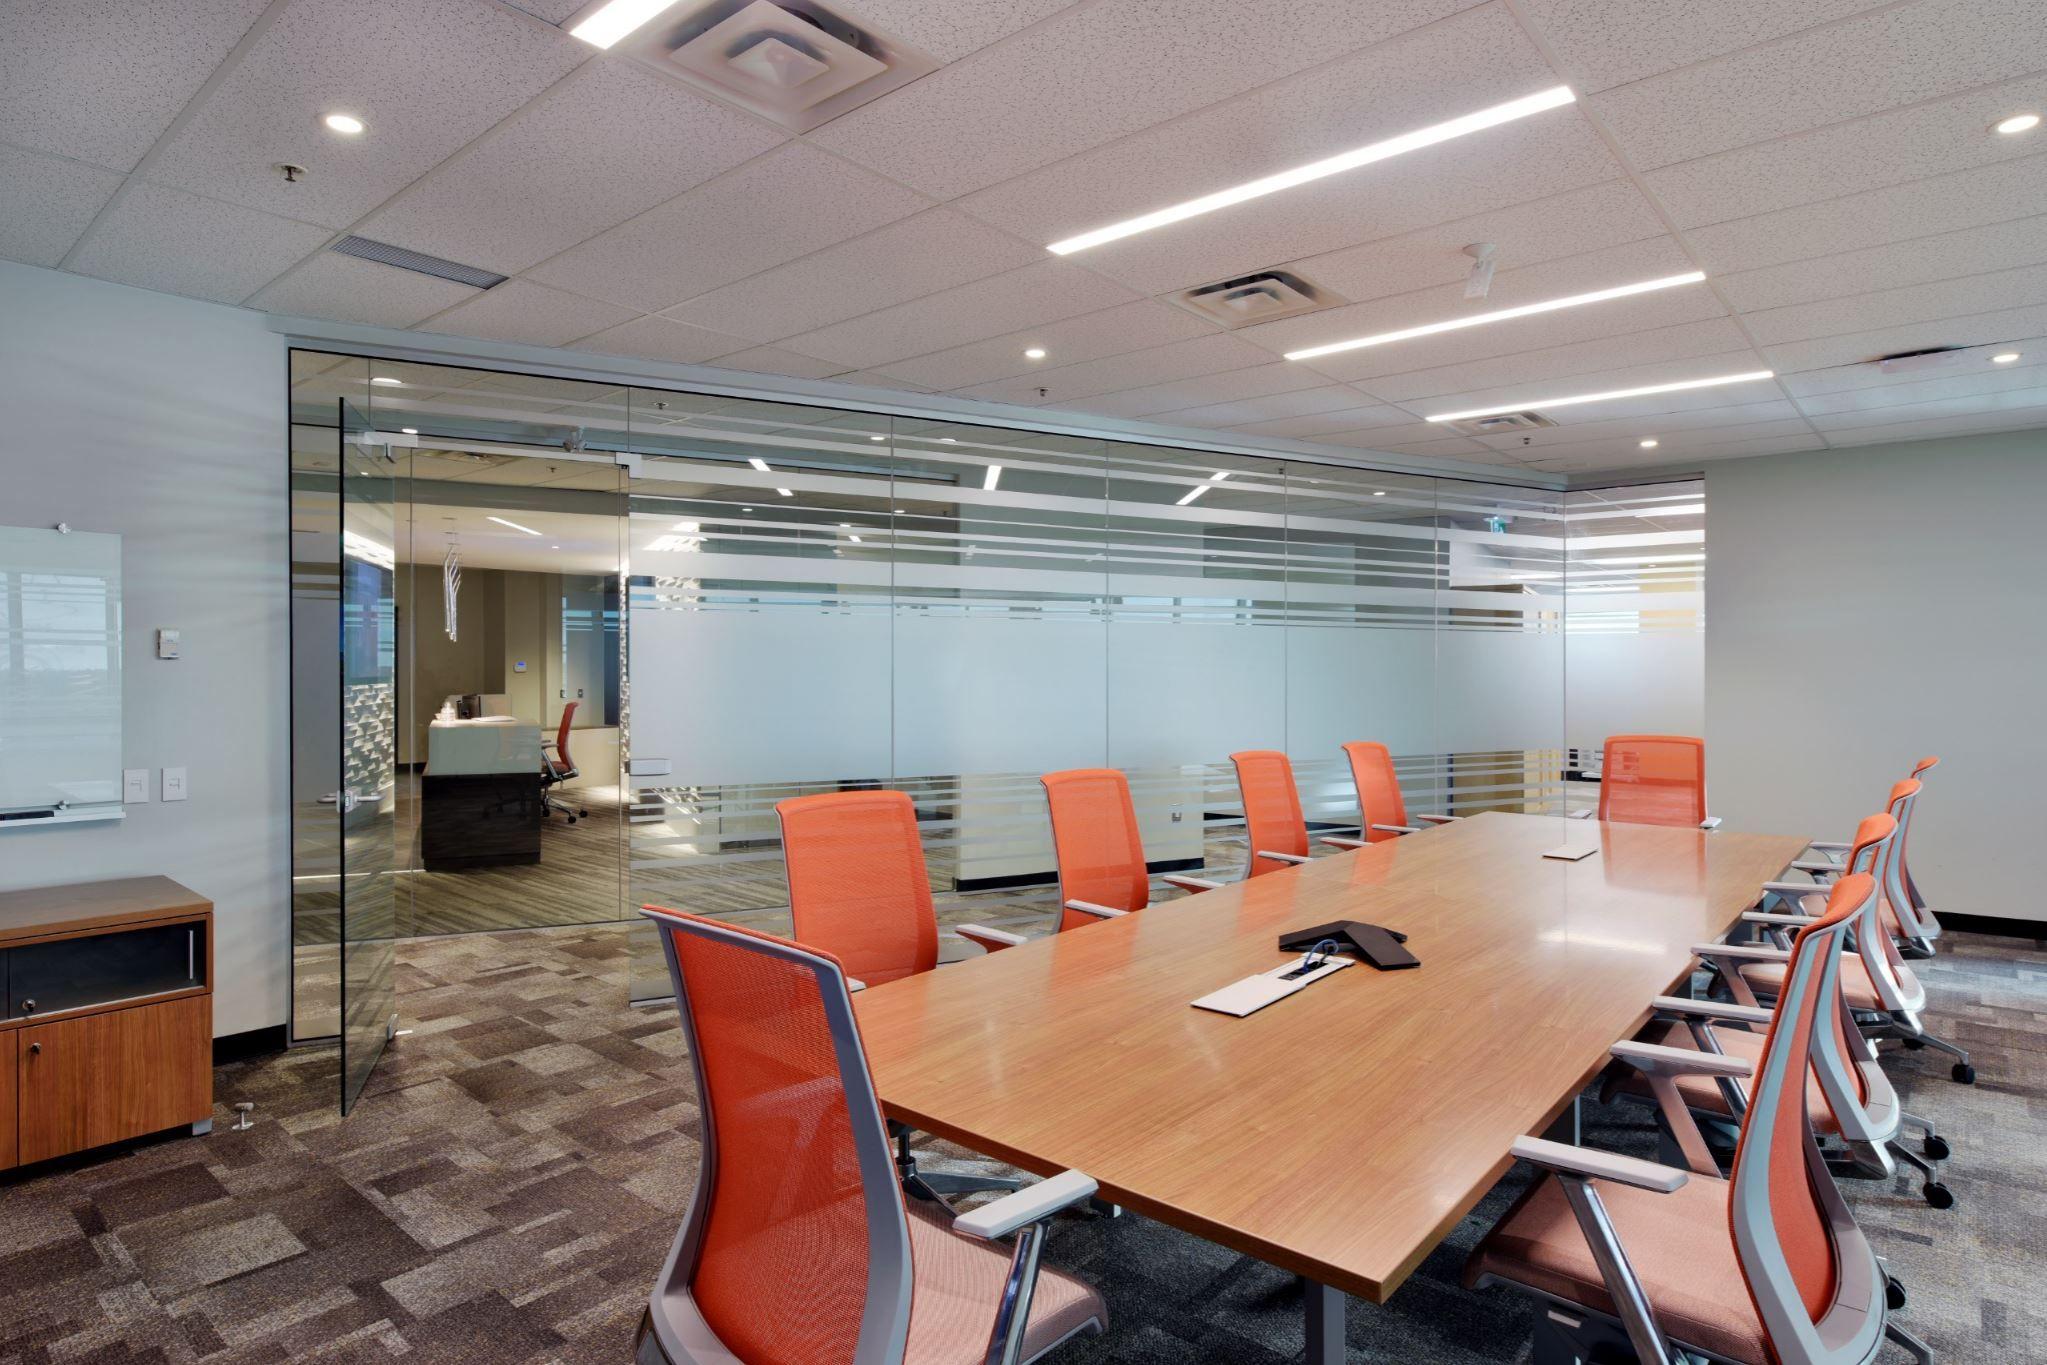 architects office design. Csv Architects, Office Lighting, Design, Interior Architecture, Modern, Architects Design